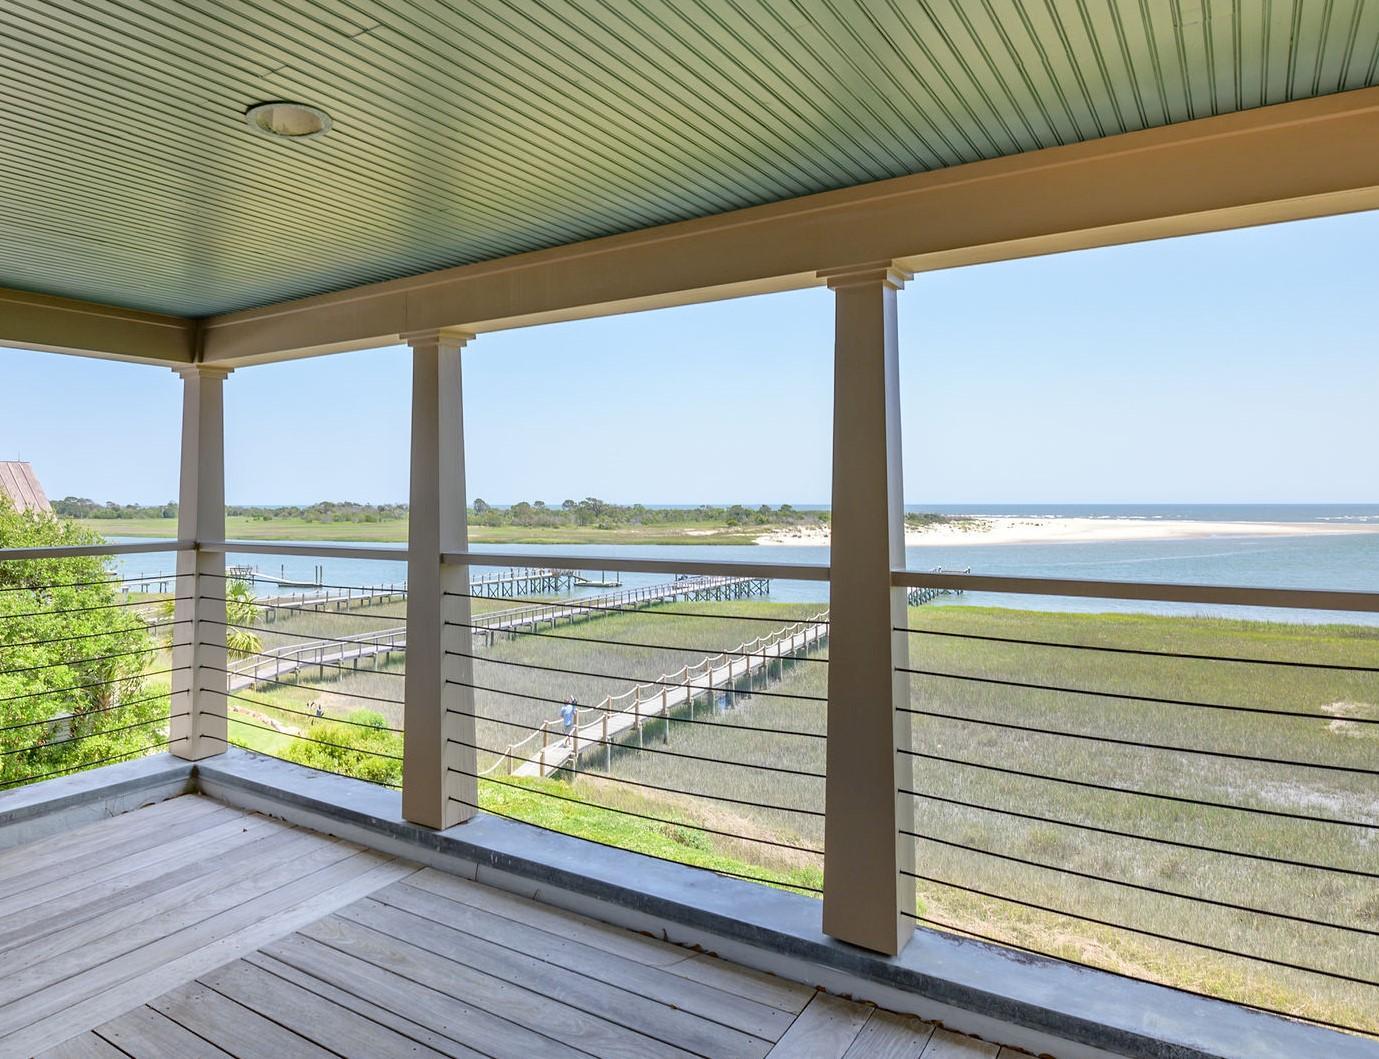 Seabrook Island Homes For Sale - 3087 Marshgate, Seabrook Island, SC - 4